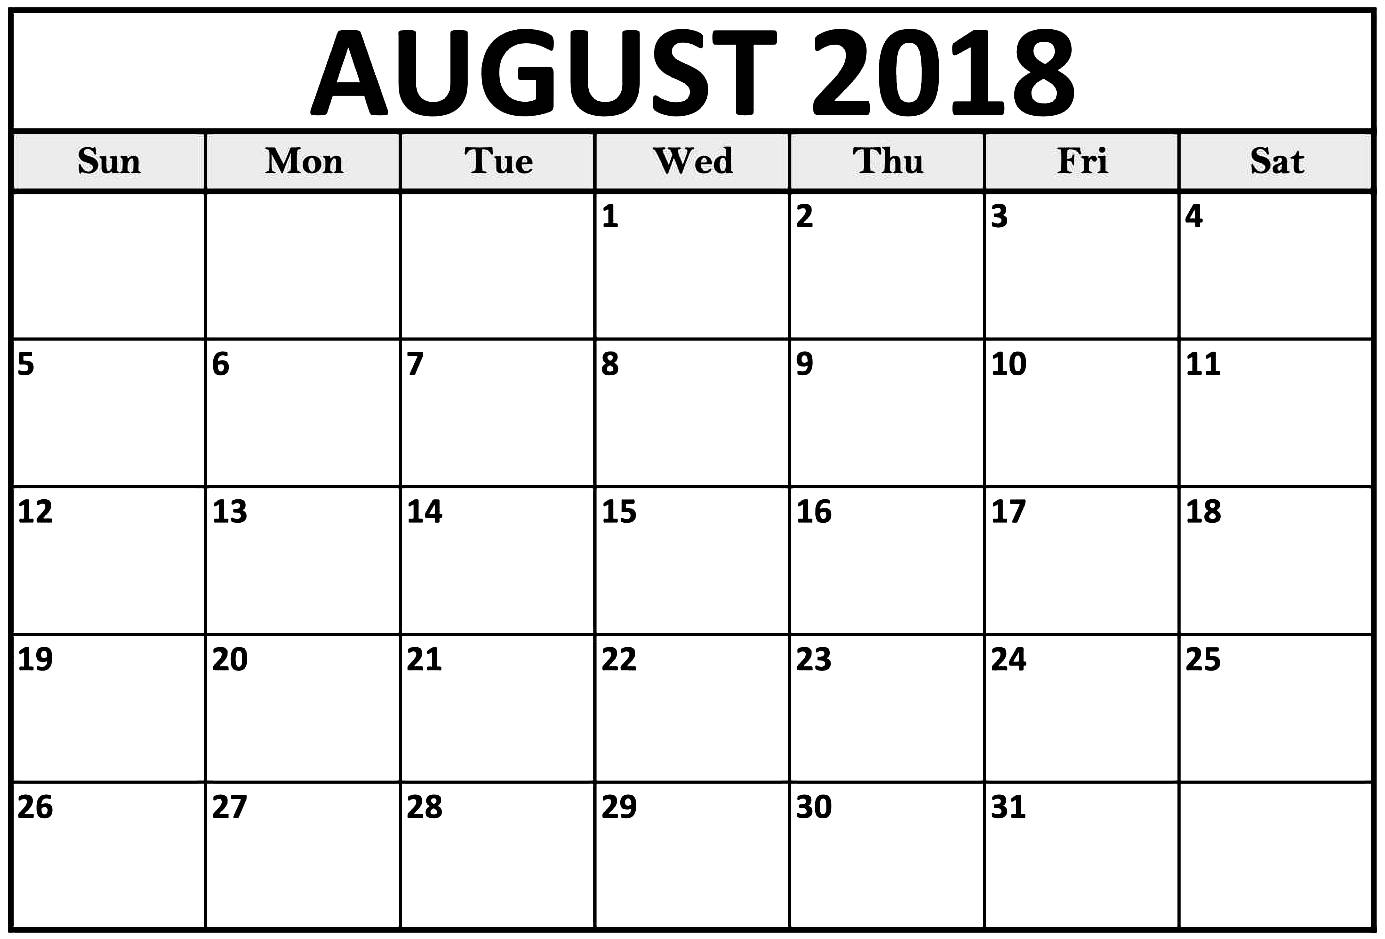 031 August Printable Calendar Outstanding 2018 Word Canada December with regard to Printable Calendar Templates August Through December